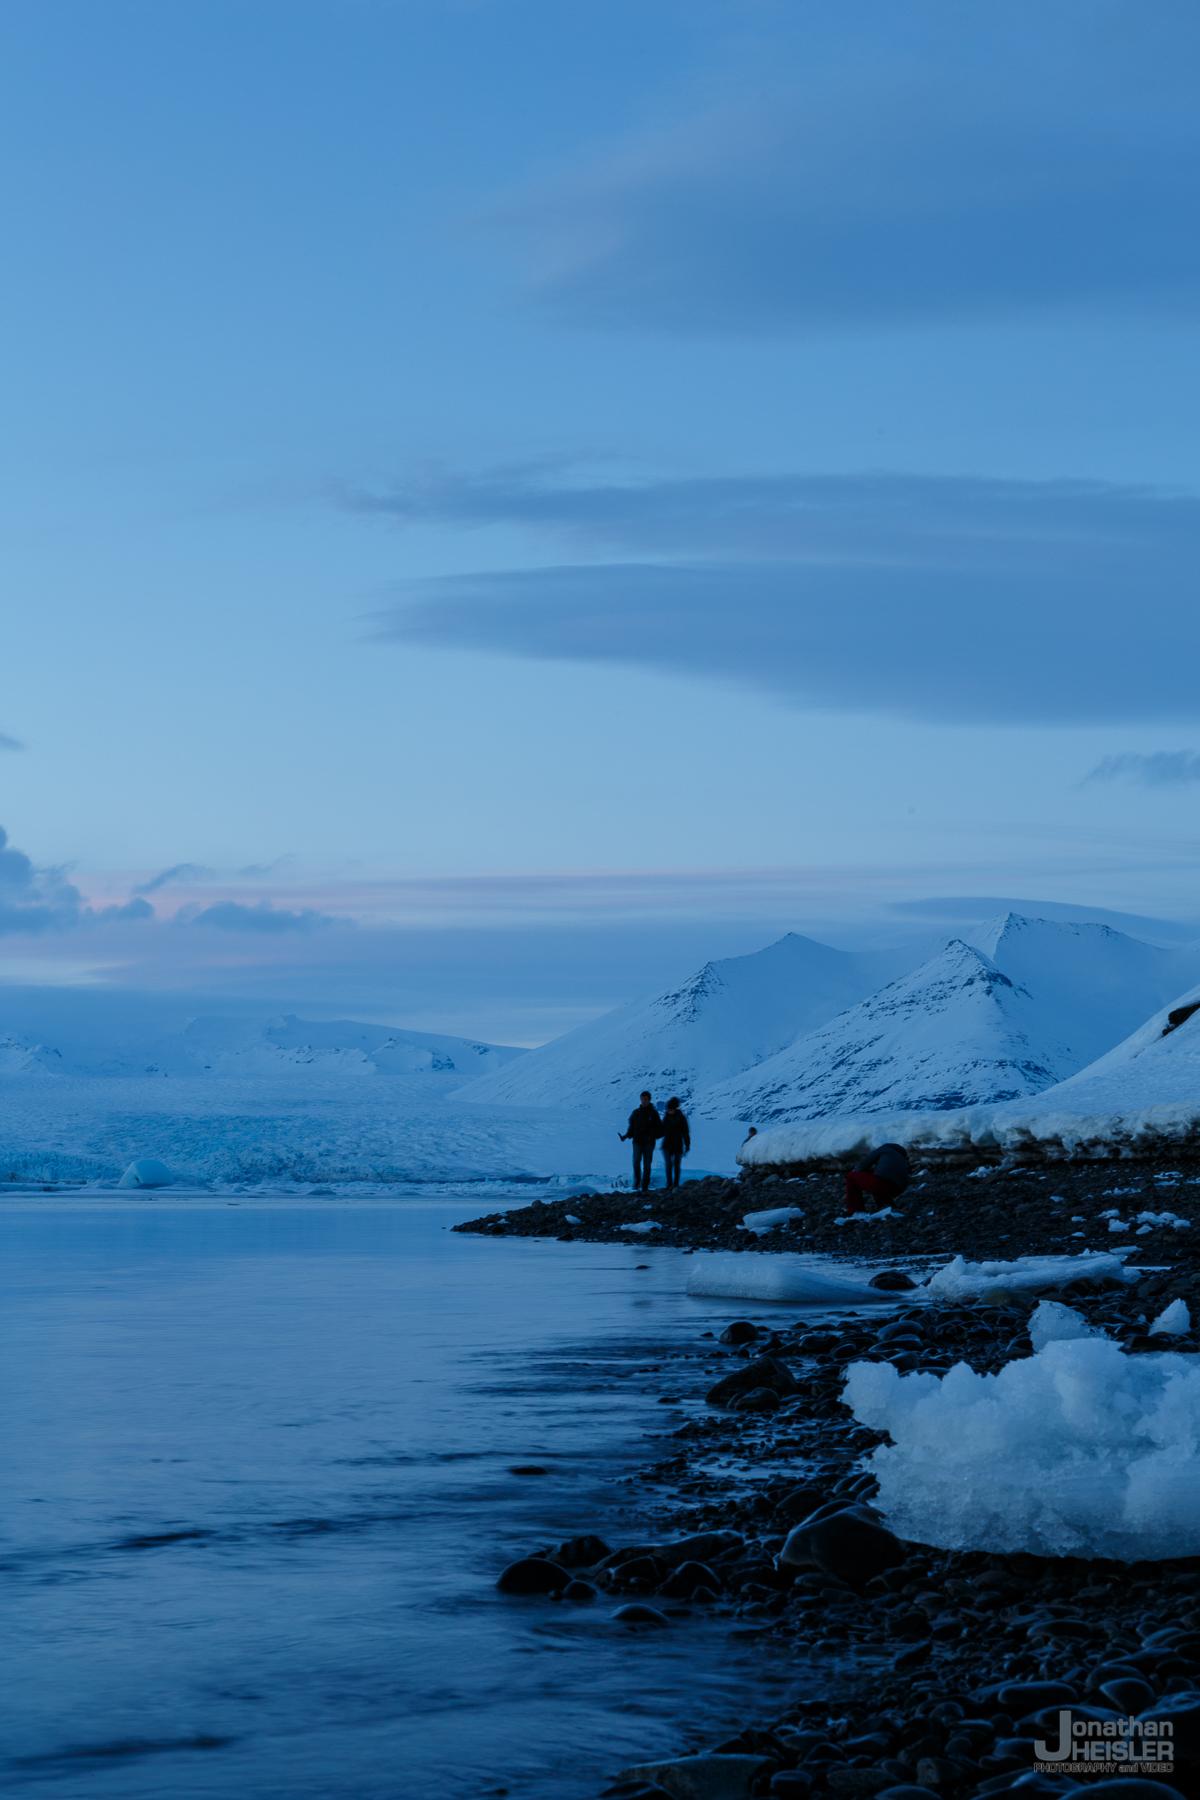 Iceland Winter Photos_  Jonathan Heisler __  02292016 _ 022.jpg